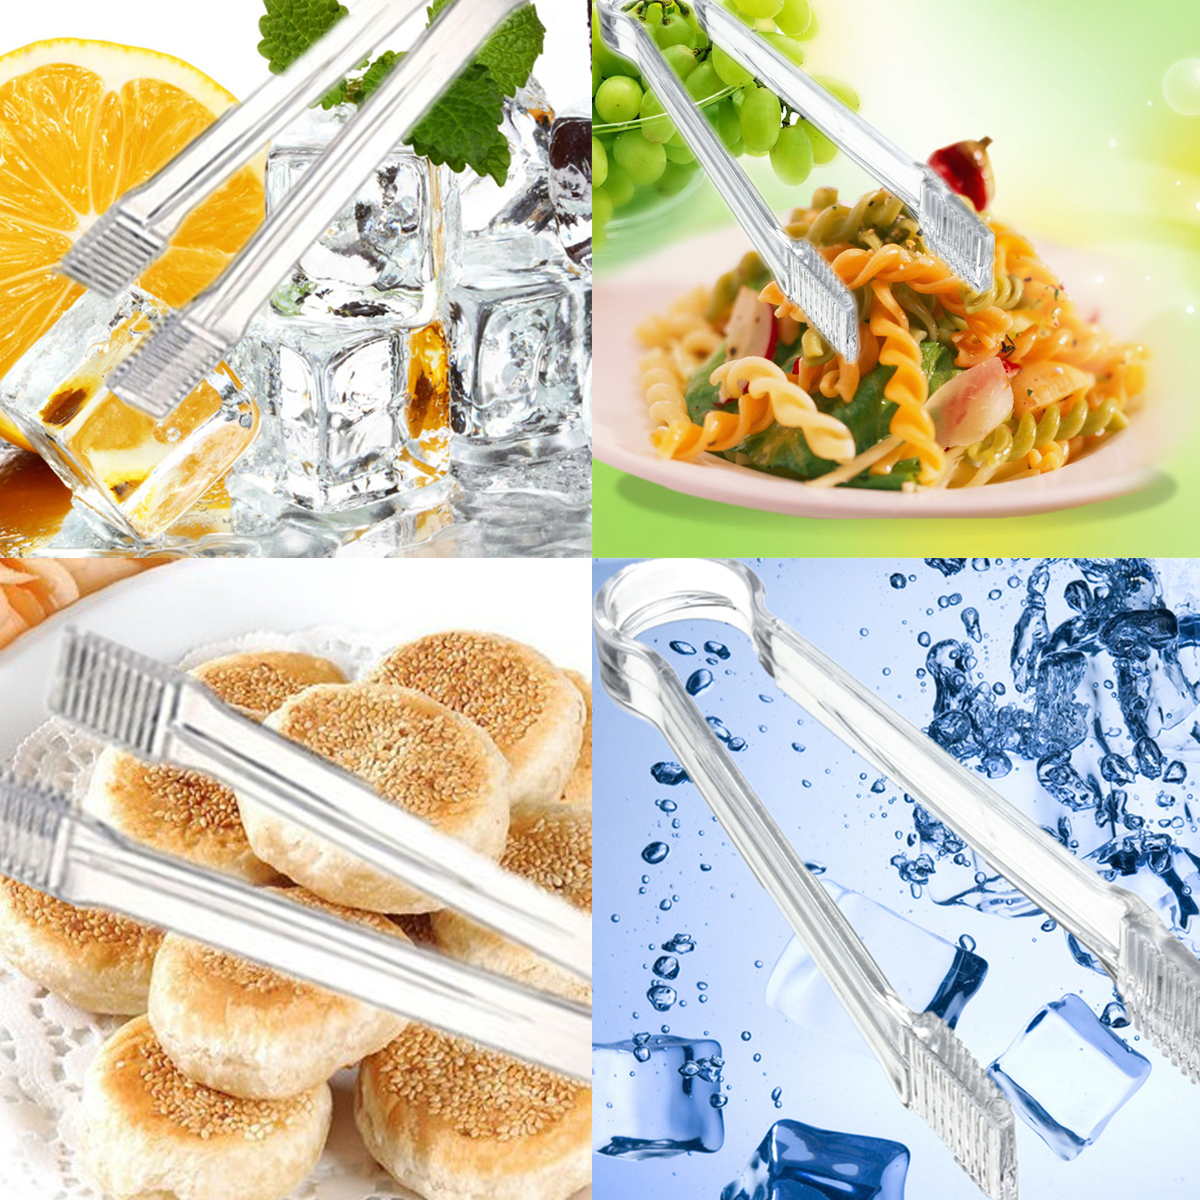 Autoleader plastic ice cube food tong clip bar kitchen for Food bar kitchen jkl